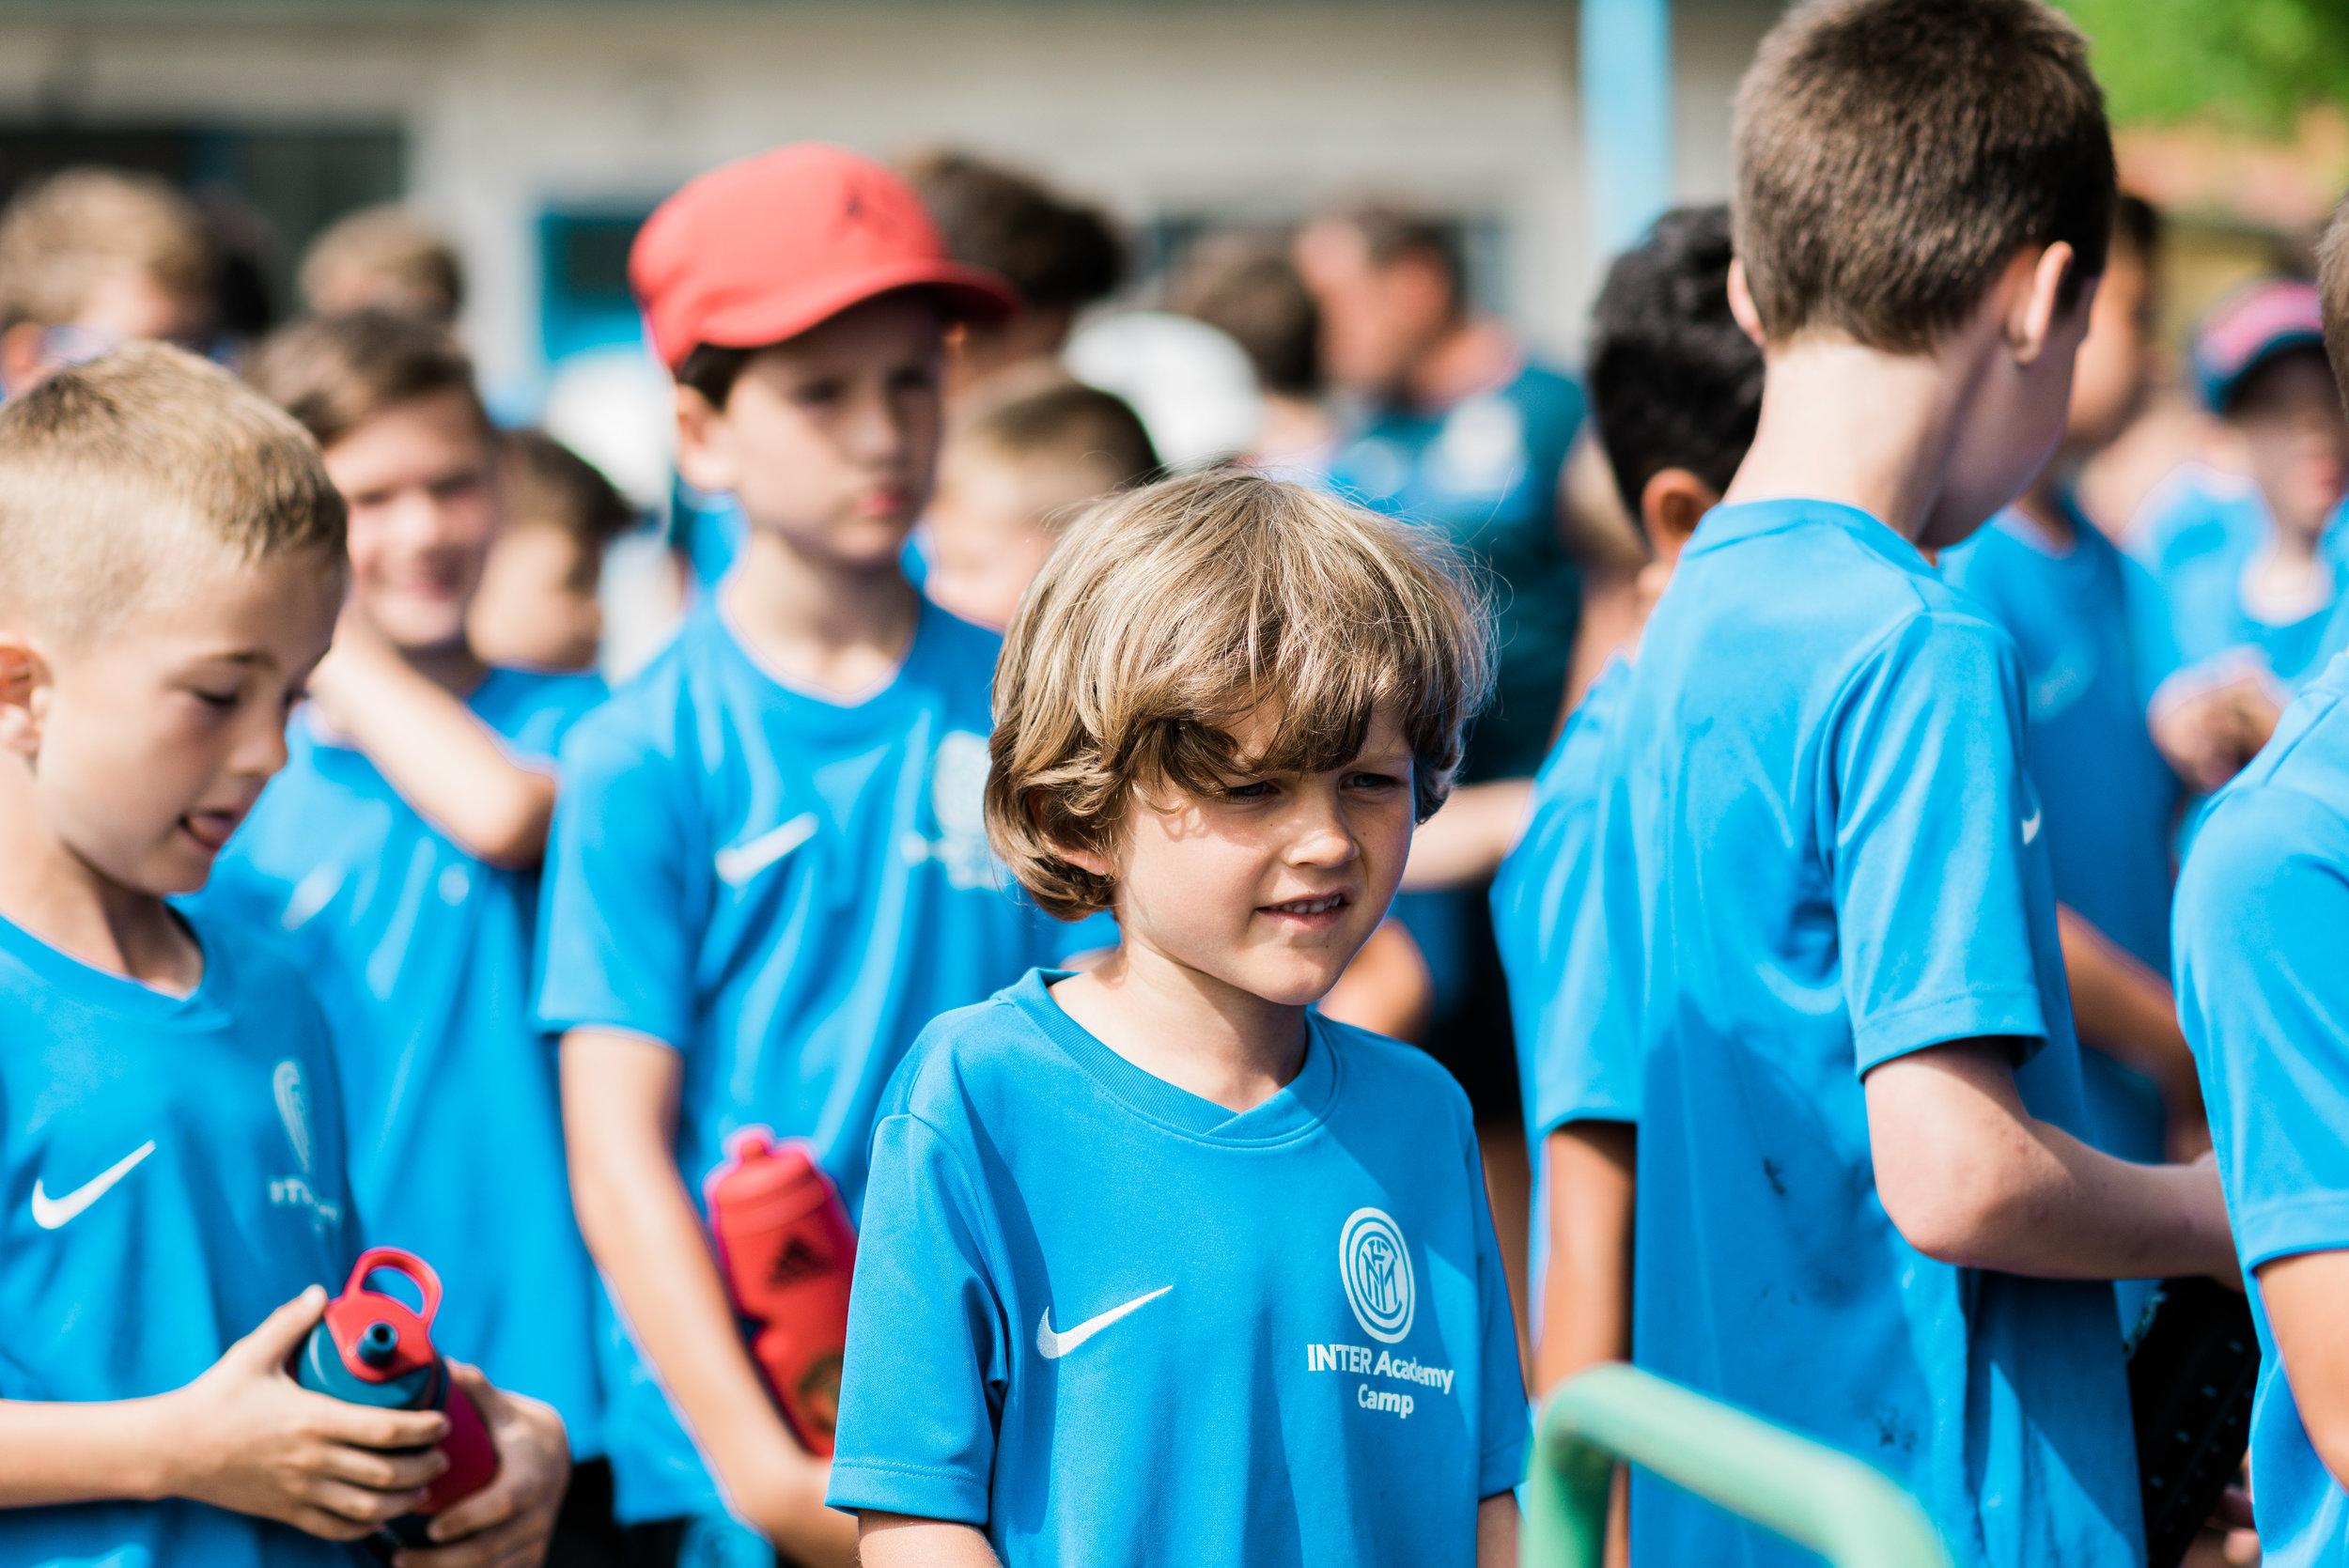 Dosa Gyozo_Inter Academy Camp Budapest-5.jpg